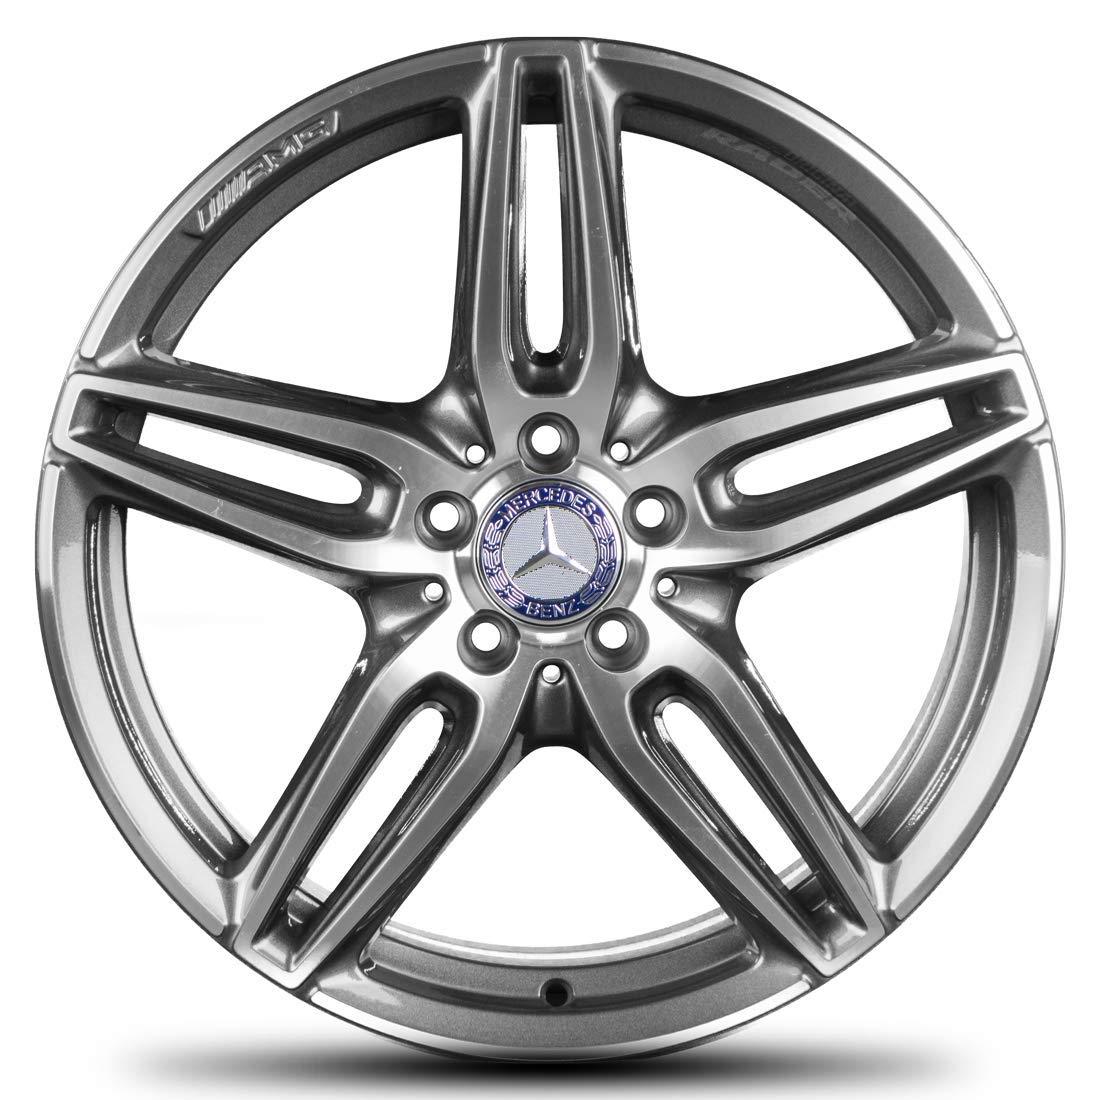 4x AMG 19 Inch Rims Mercedes Benz E-Class W213 S213 C238 A238 Alloy Wheels